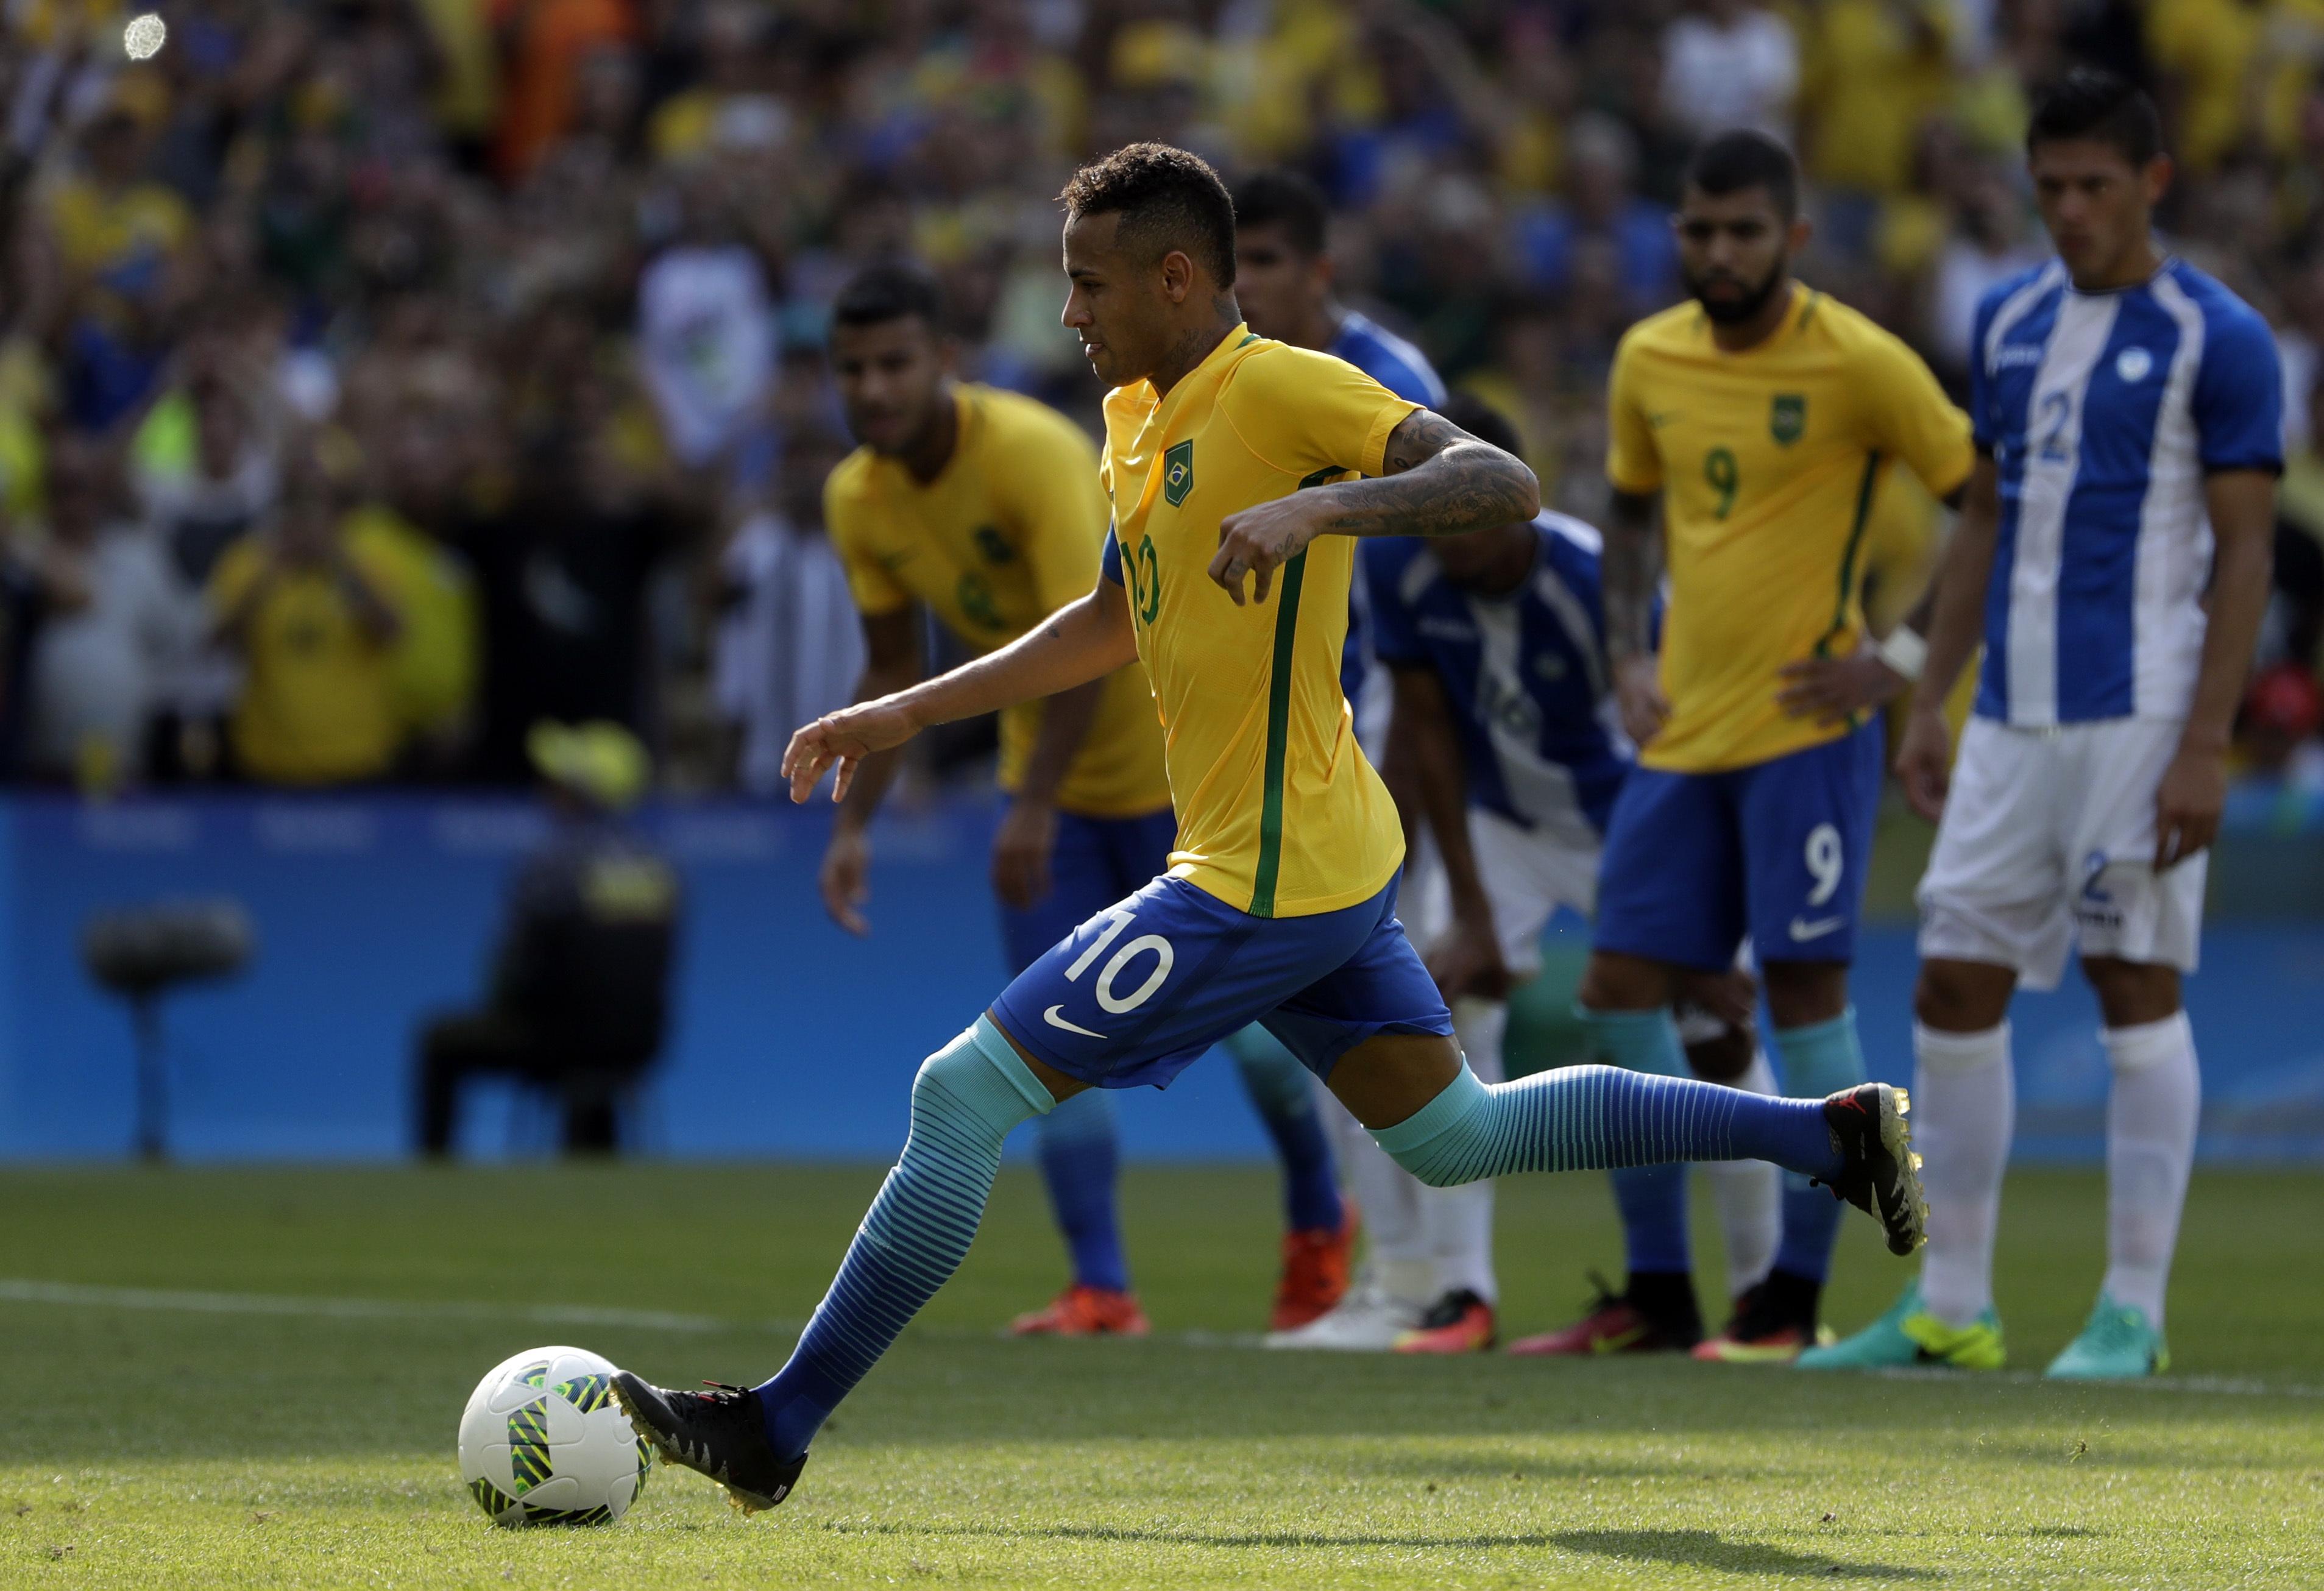 Brazil's Neymar kicks a penalty to score his team's fifth goal during a semifinal match of the men's Olympic football tournament between Brazil and Honduras at the Maracana stadium in Rio de Janeiro Wednesday Aug. 17, 2016.(AP Photo/Felipe Dana)